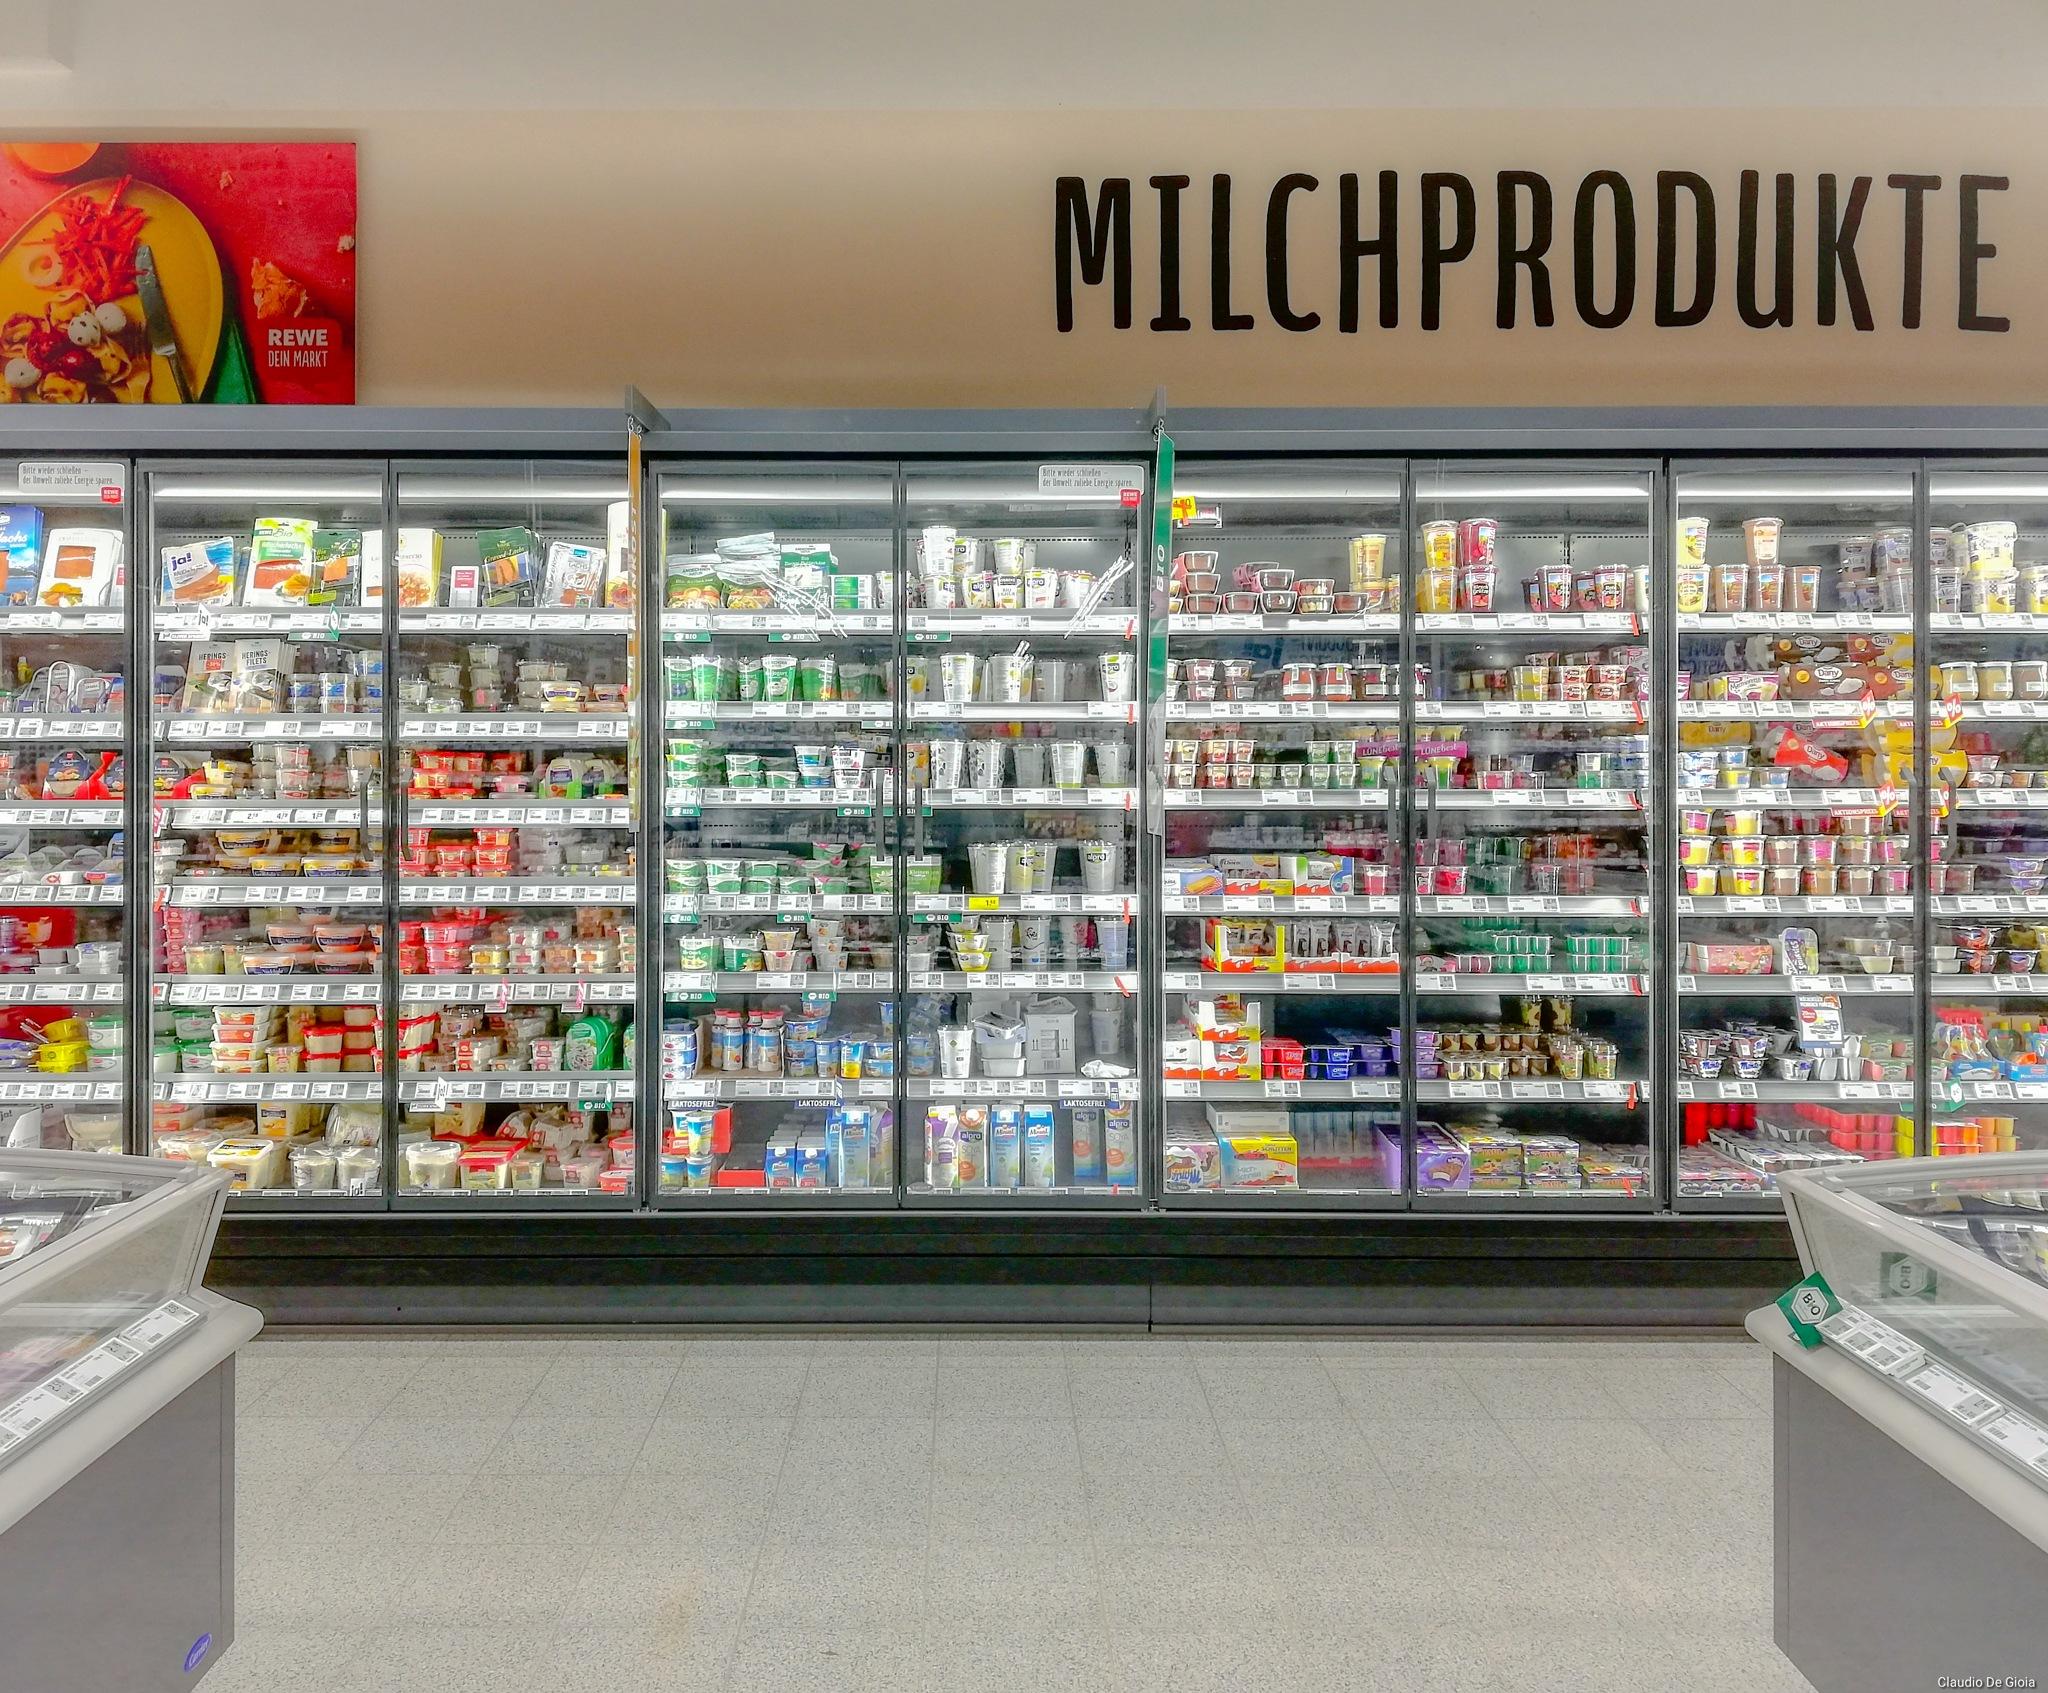 Supermercado  by robyluz_photo